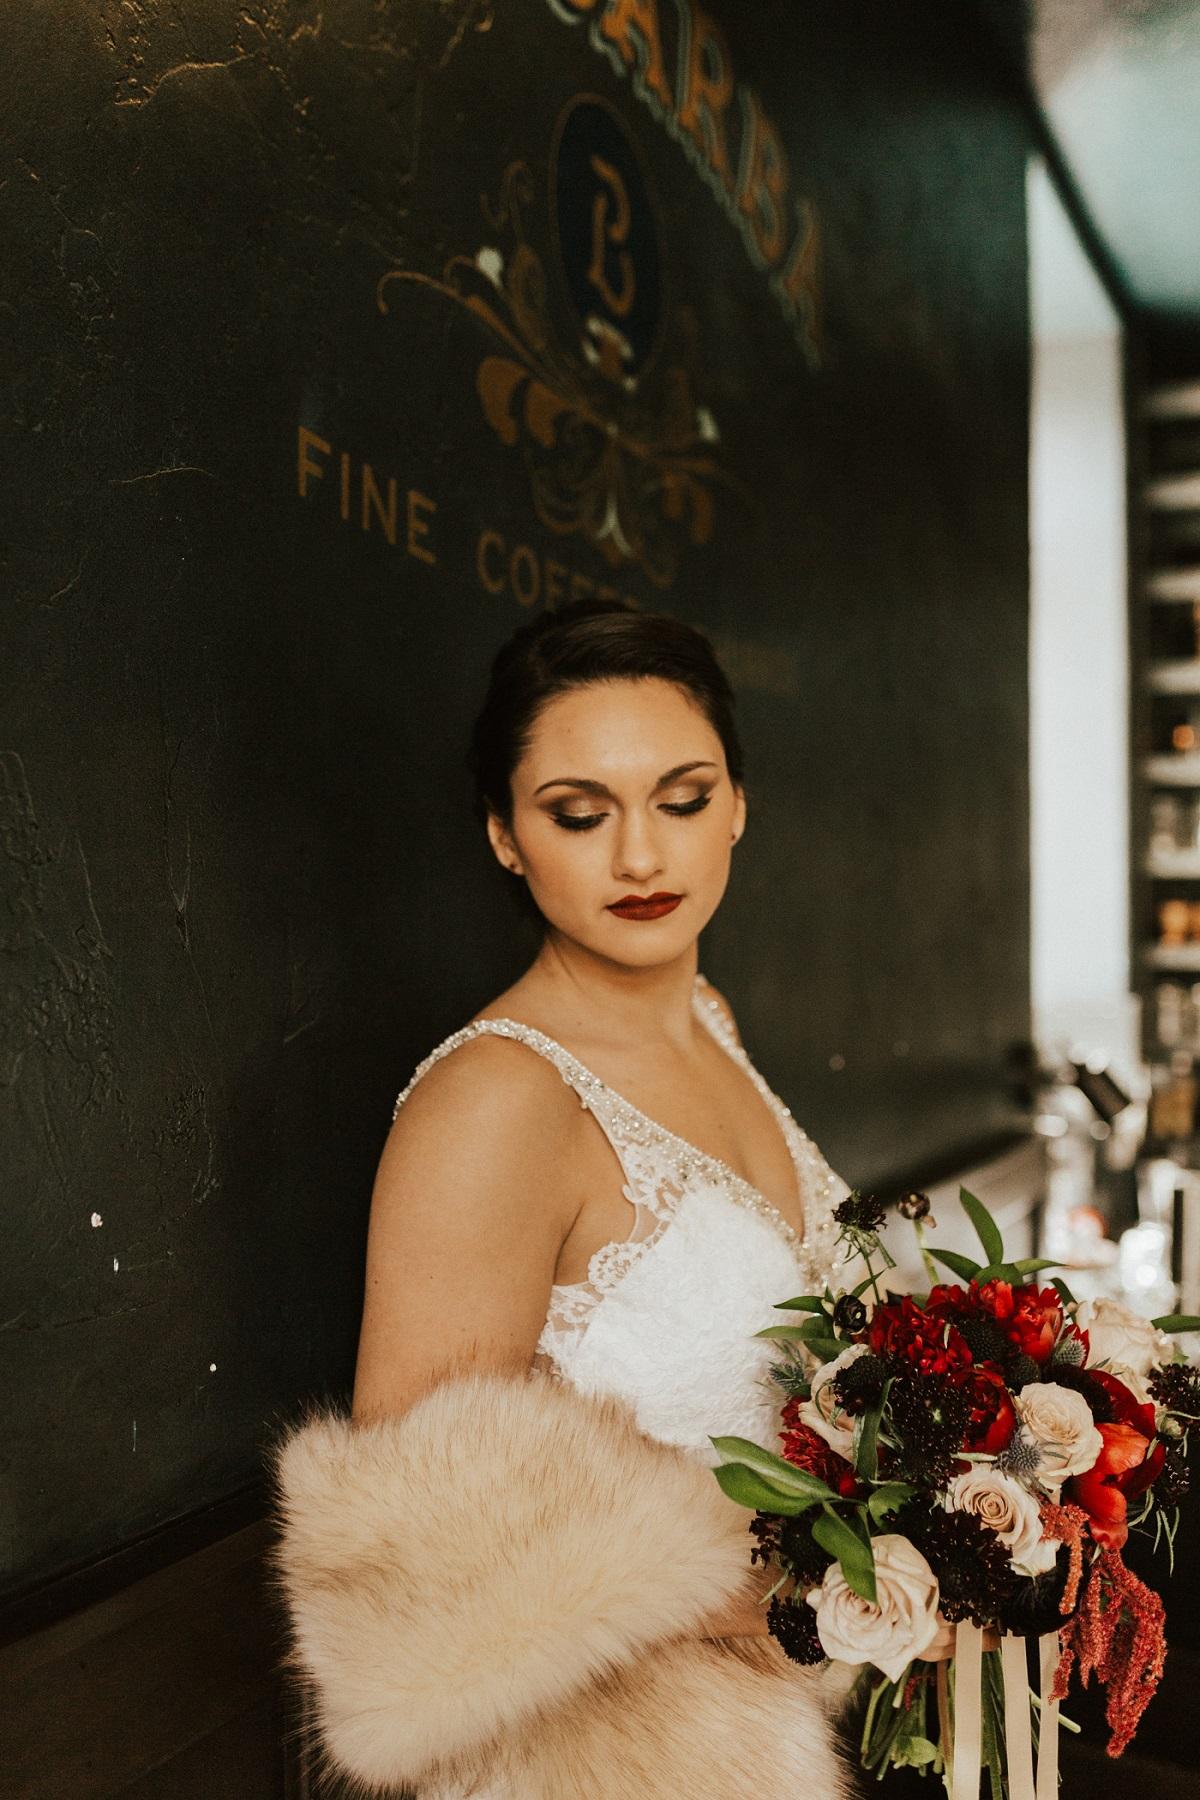 Bruid met bontjasje over haar trouwjurk